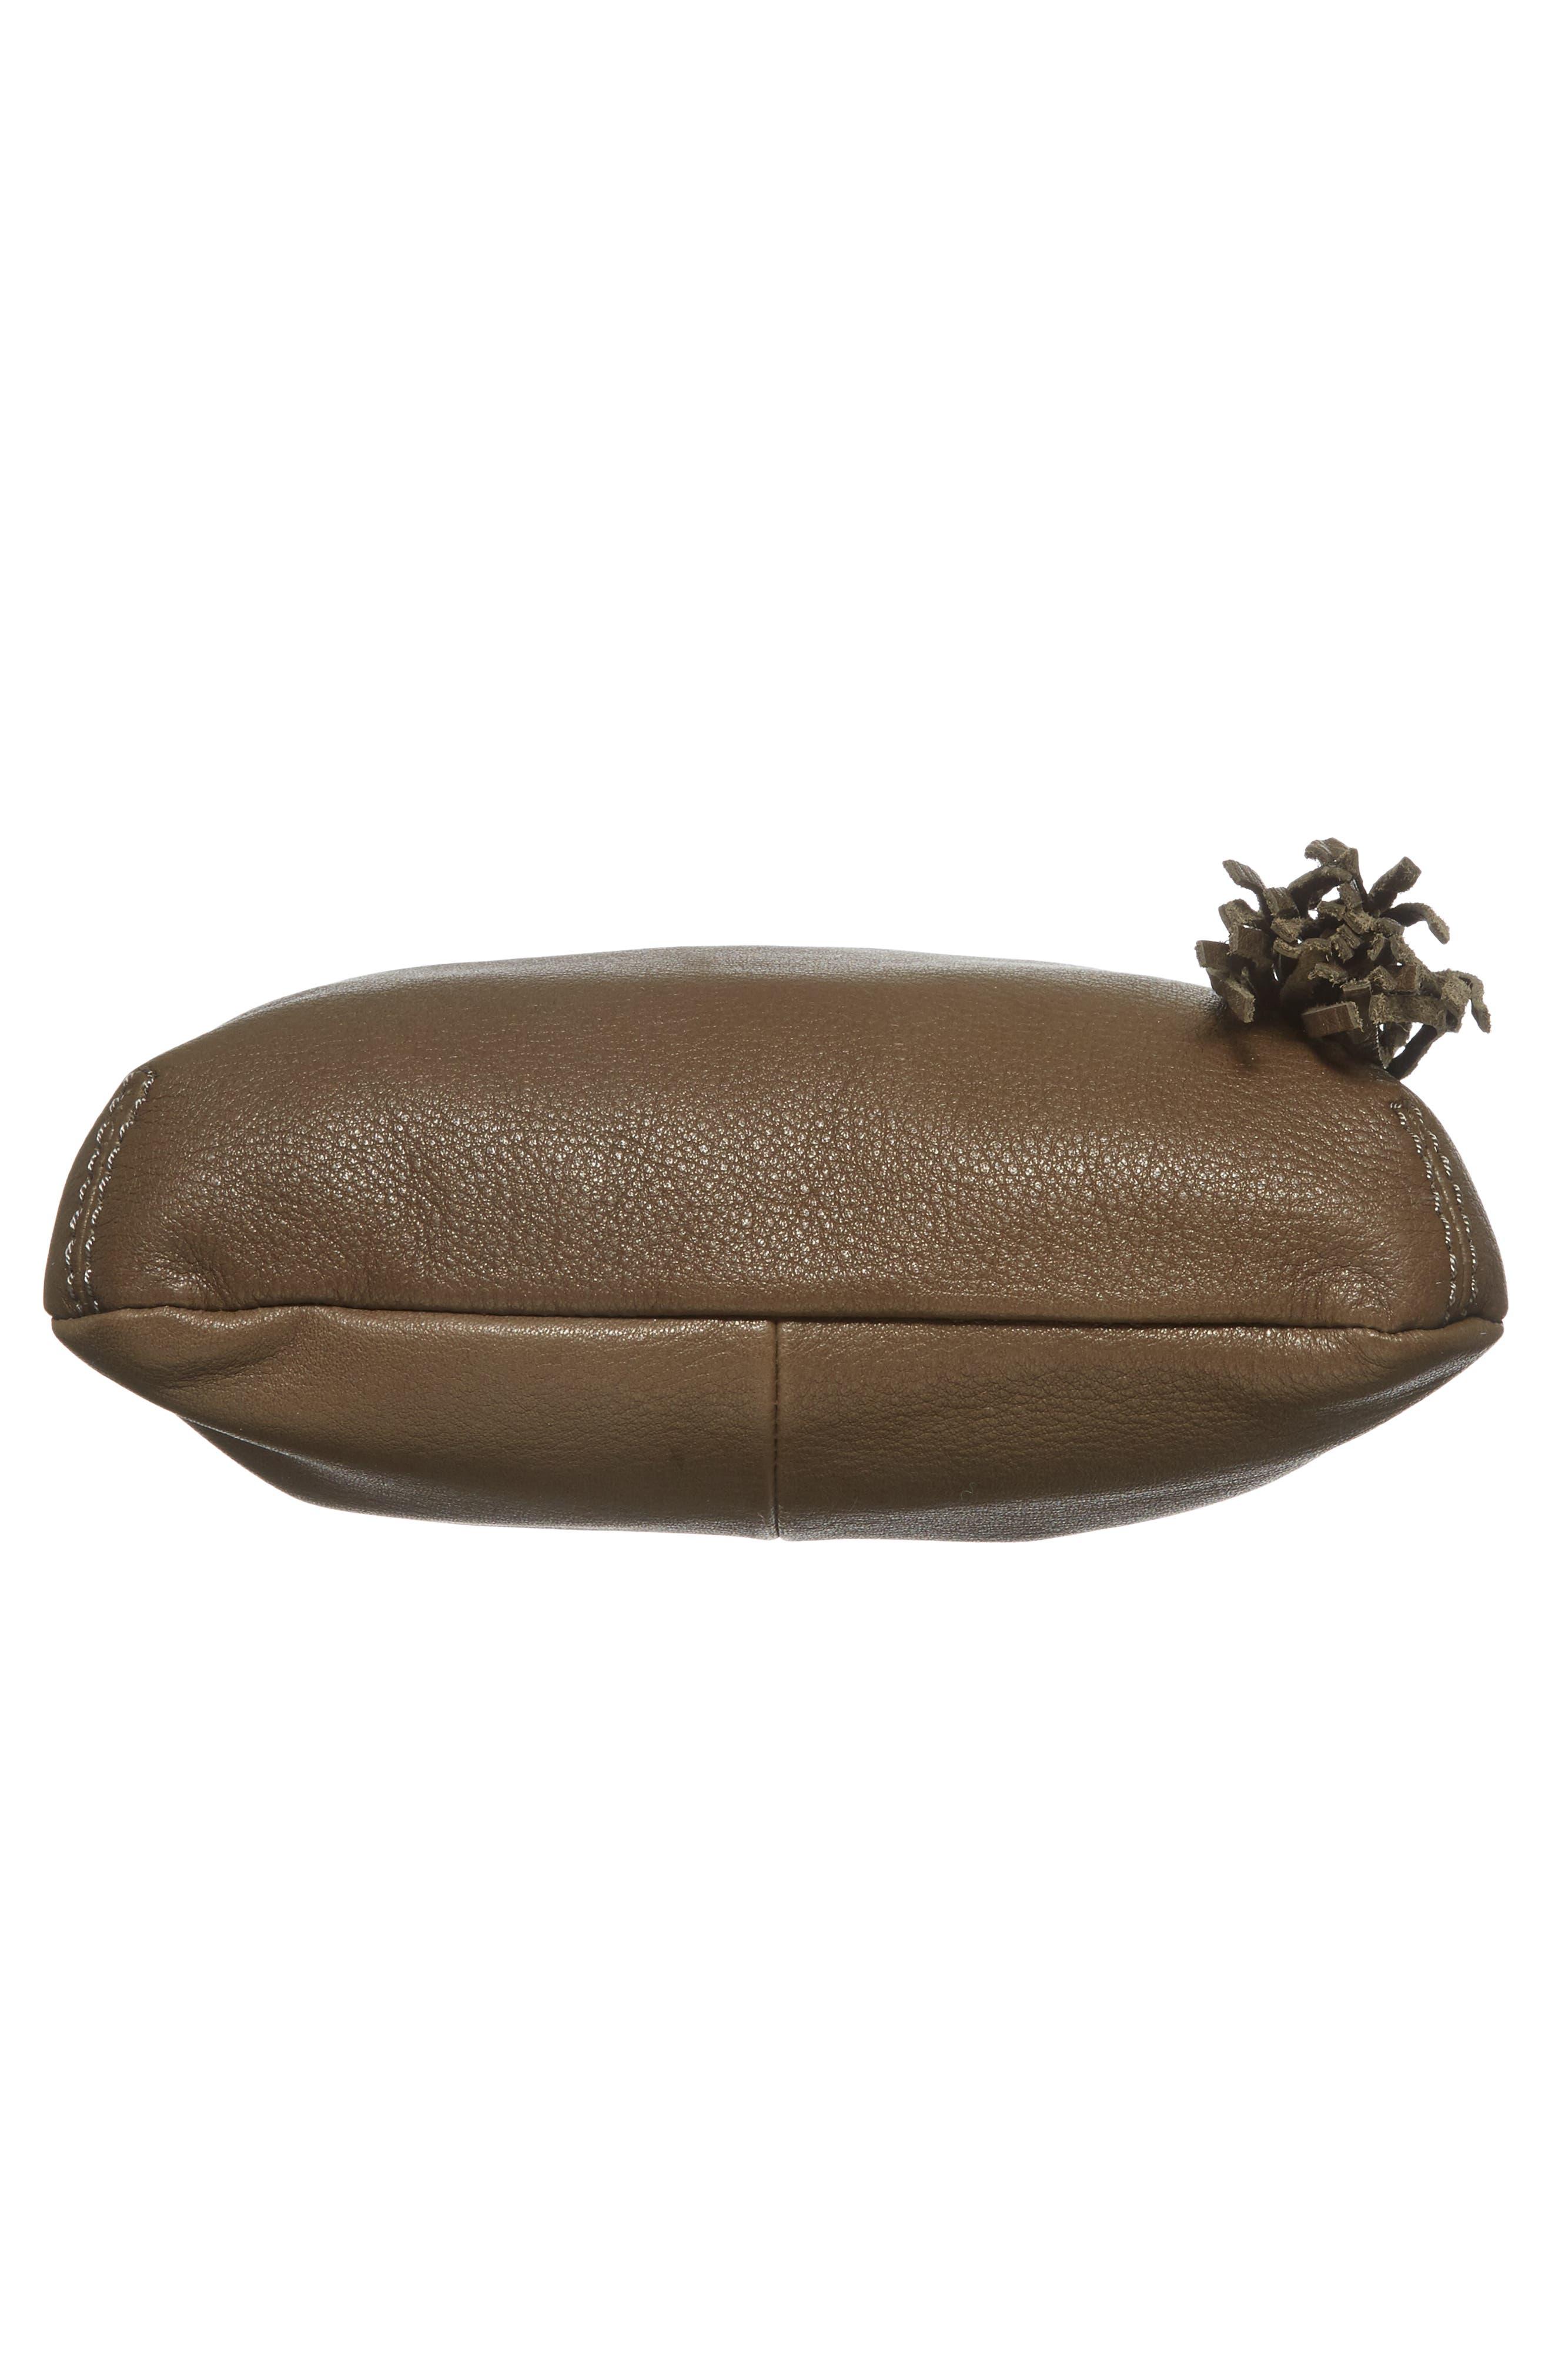 'Sarah' Leather Crossbody Bag,                             Alternate thumbnail 29, color,